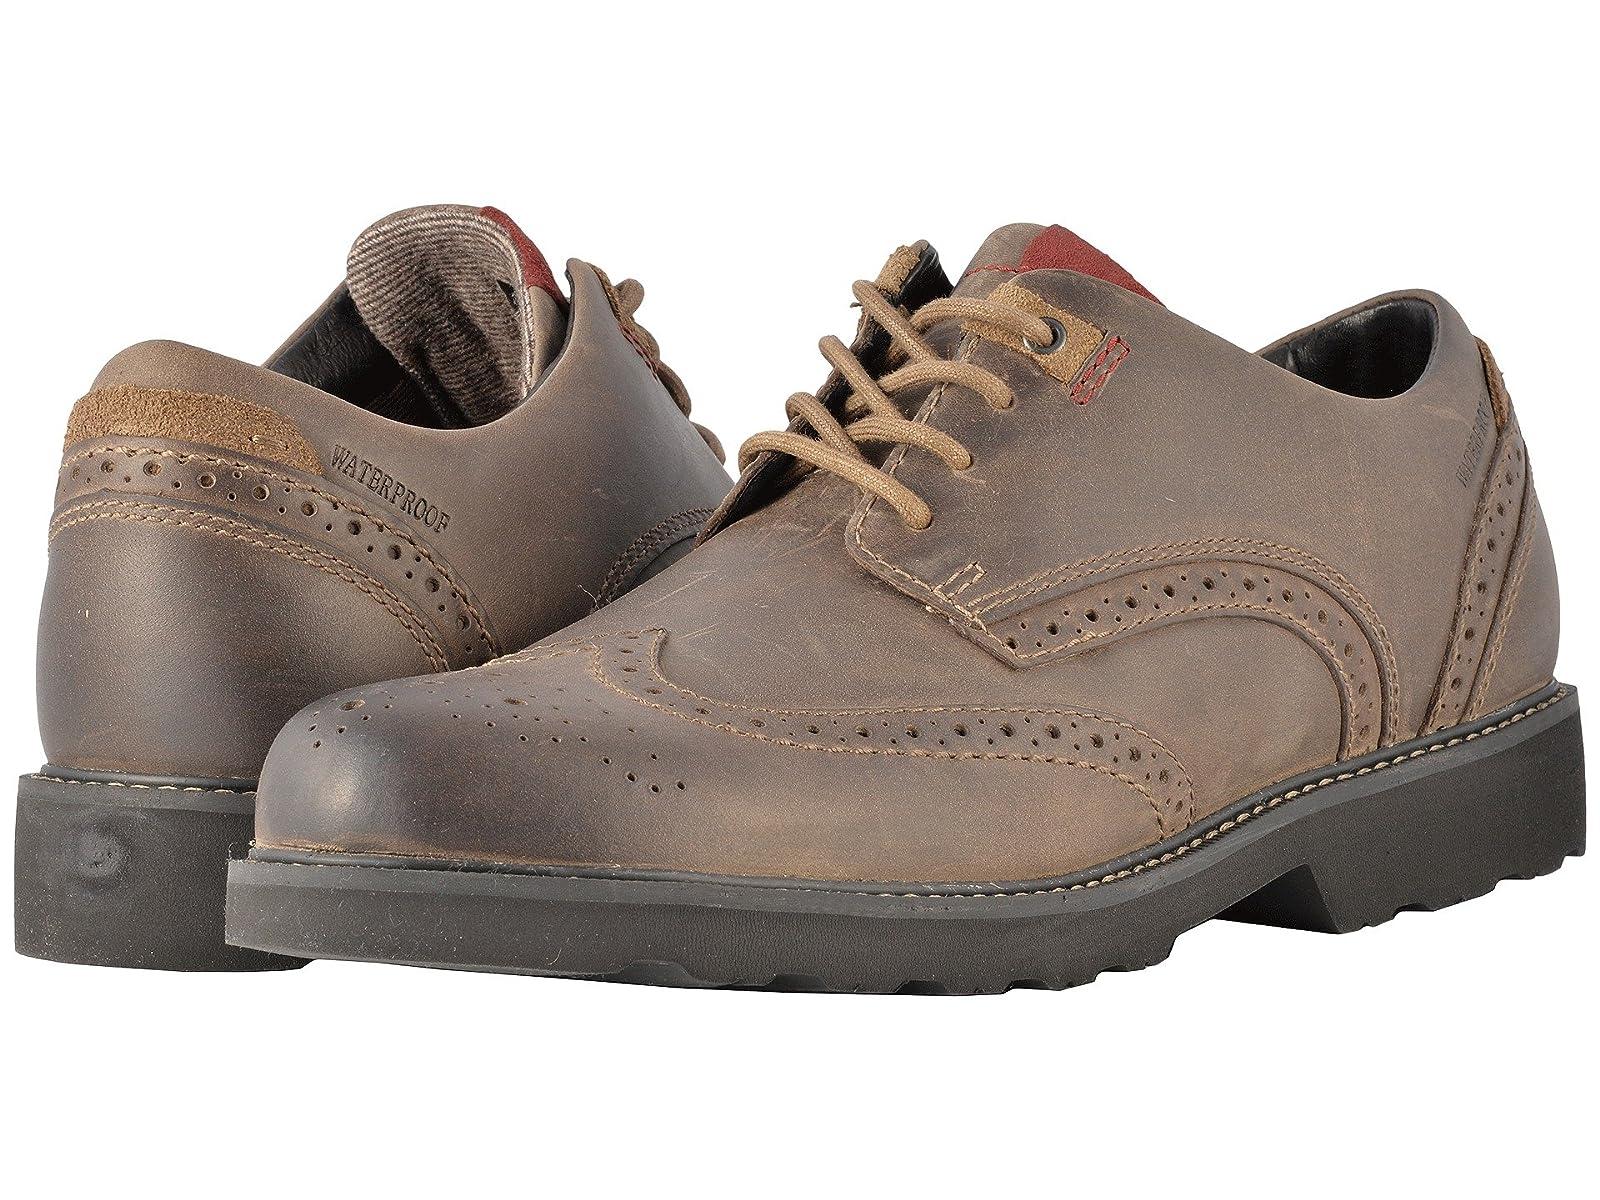 Dunham REVdare WaterproofAtmospheric grades have affordable shoes